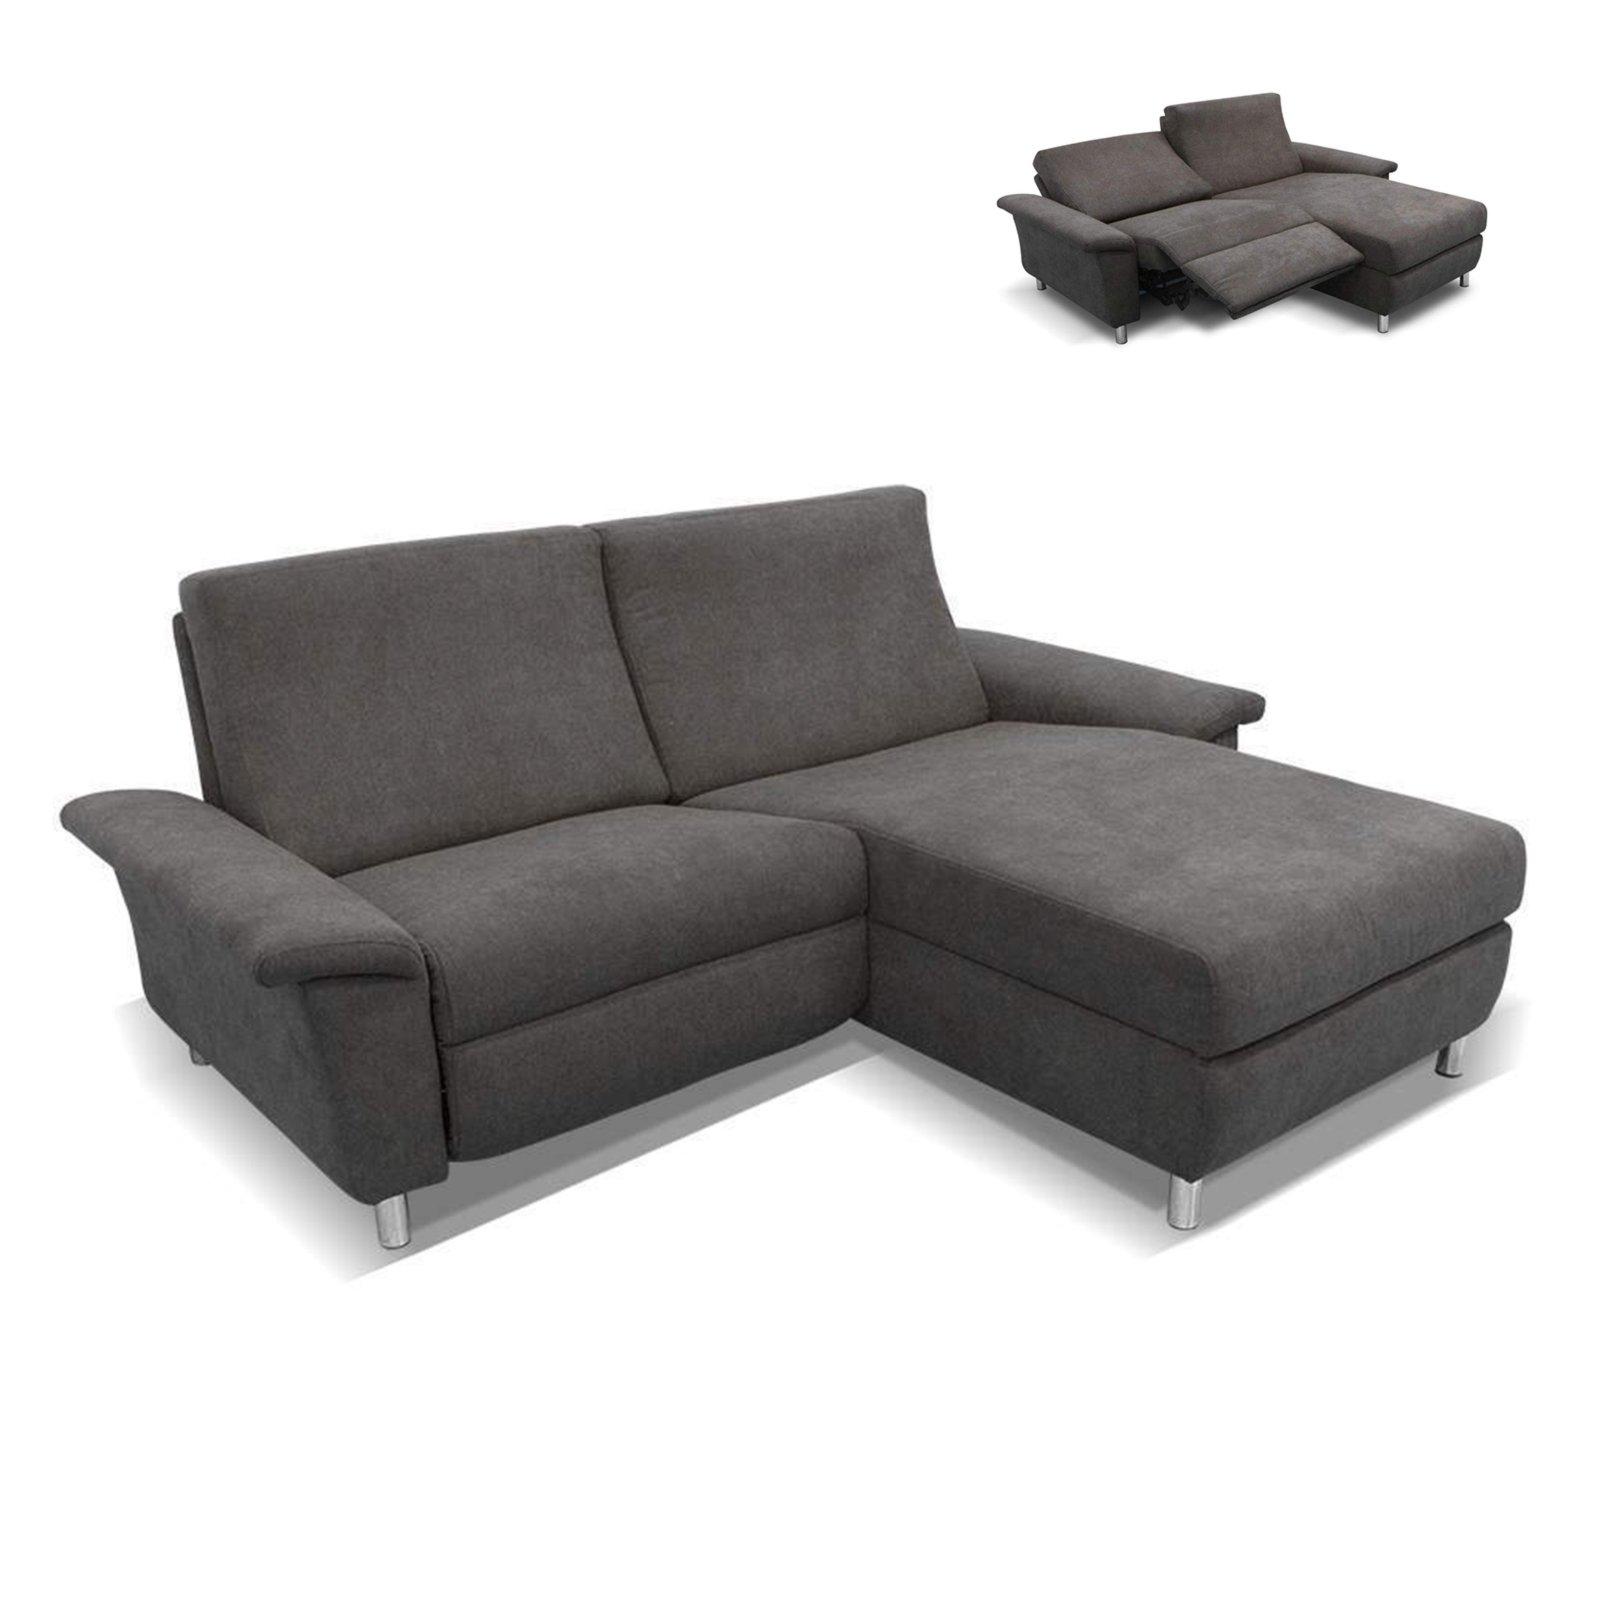 ecksofa schlamm recamiere rechts relaxfunktion. Black Bedroom Furniture Sets. Home Design Ideas